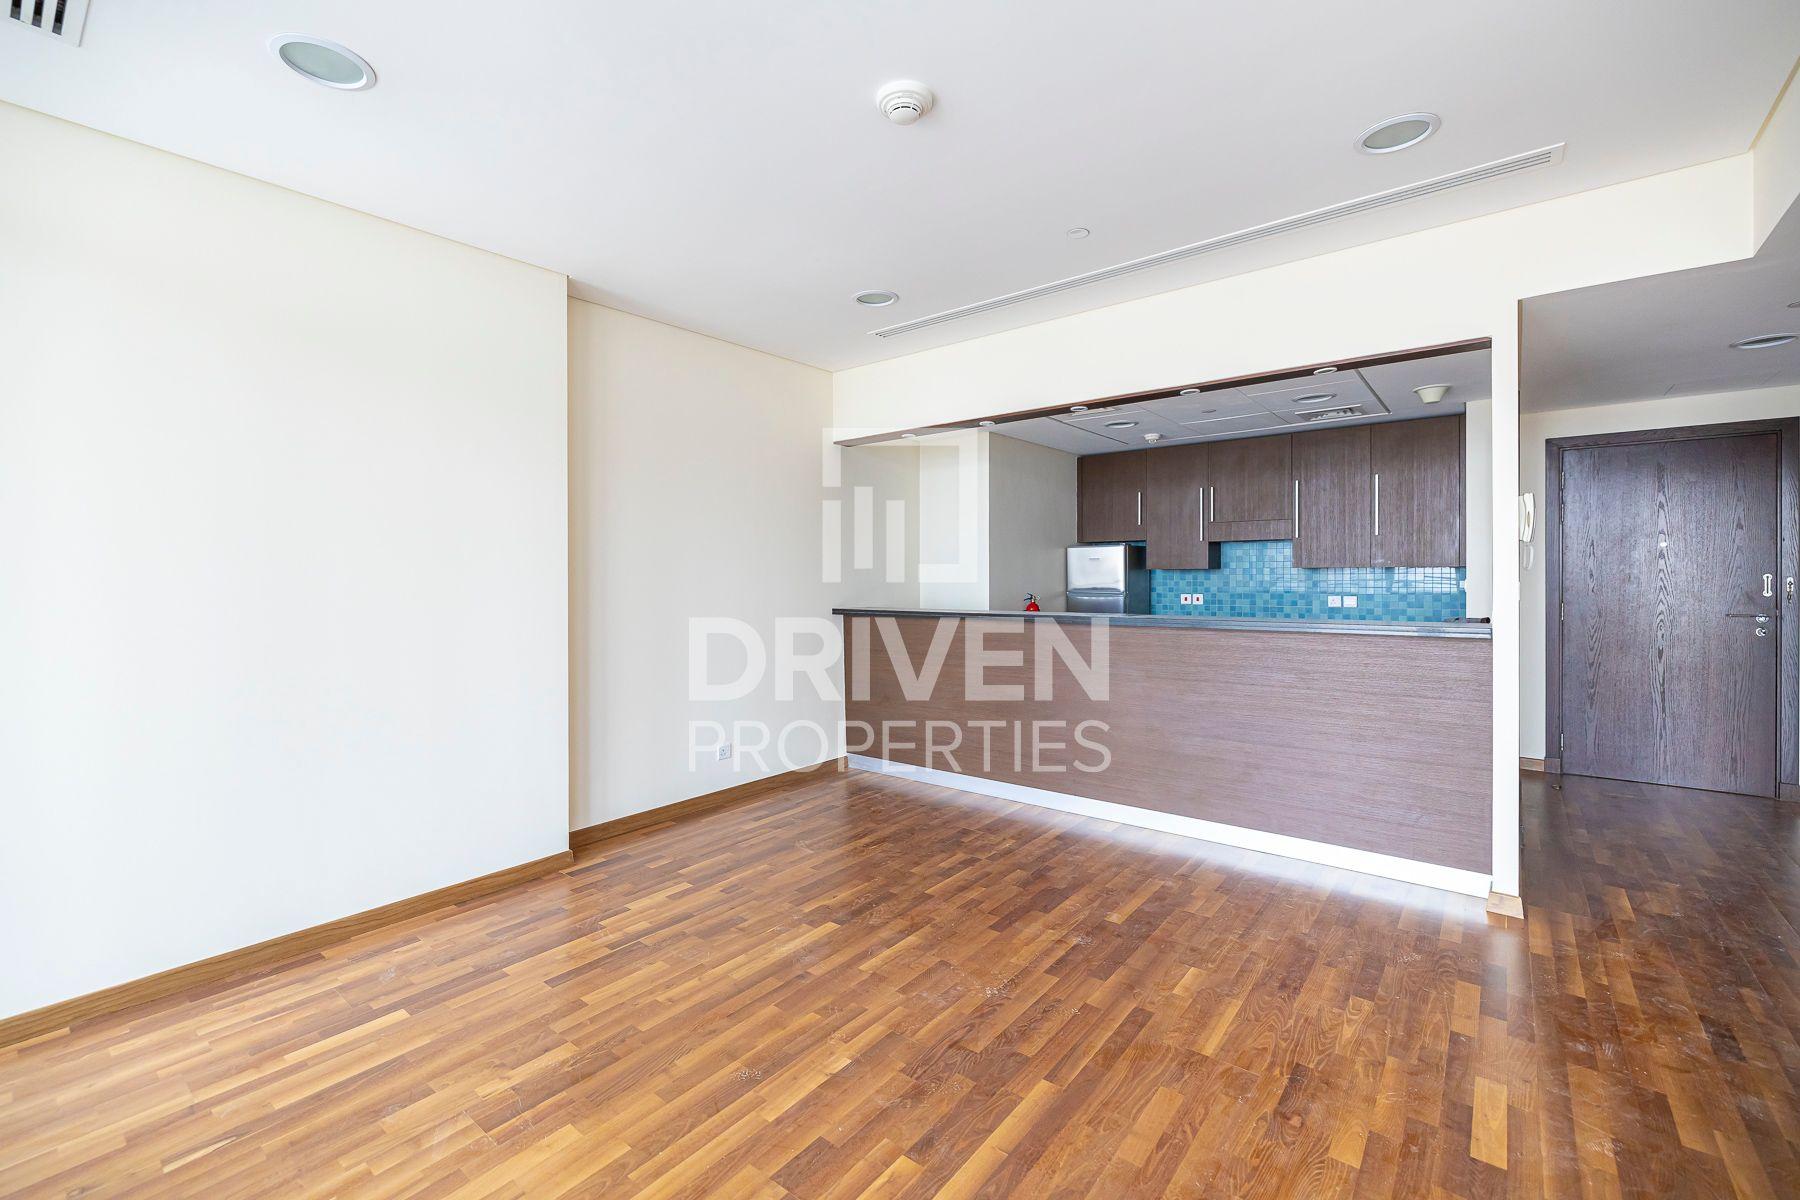 Elegant 1 Bed Apartment, Partly Furnished